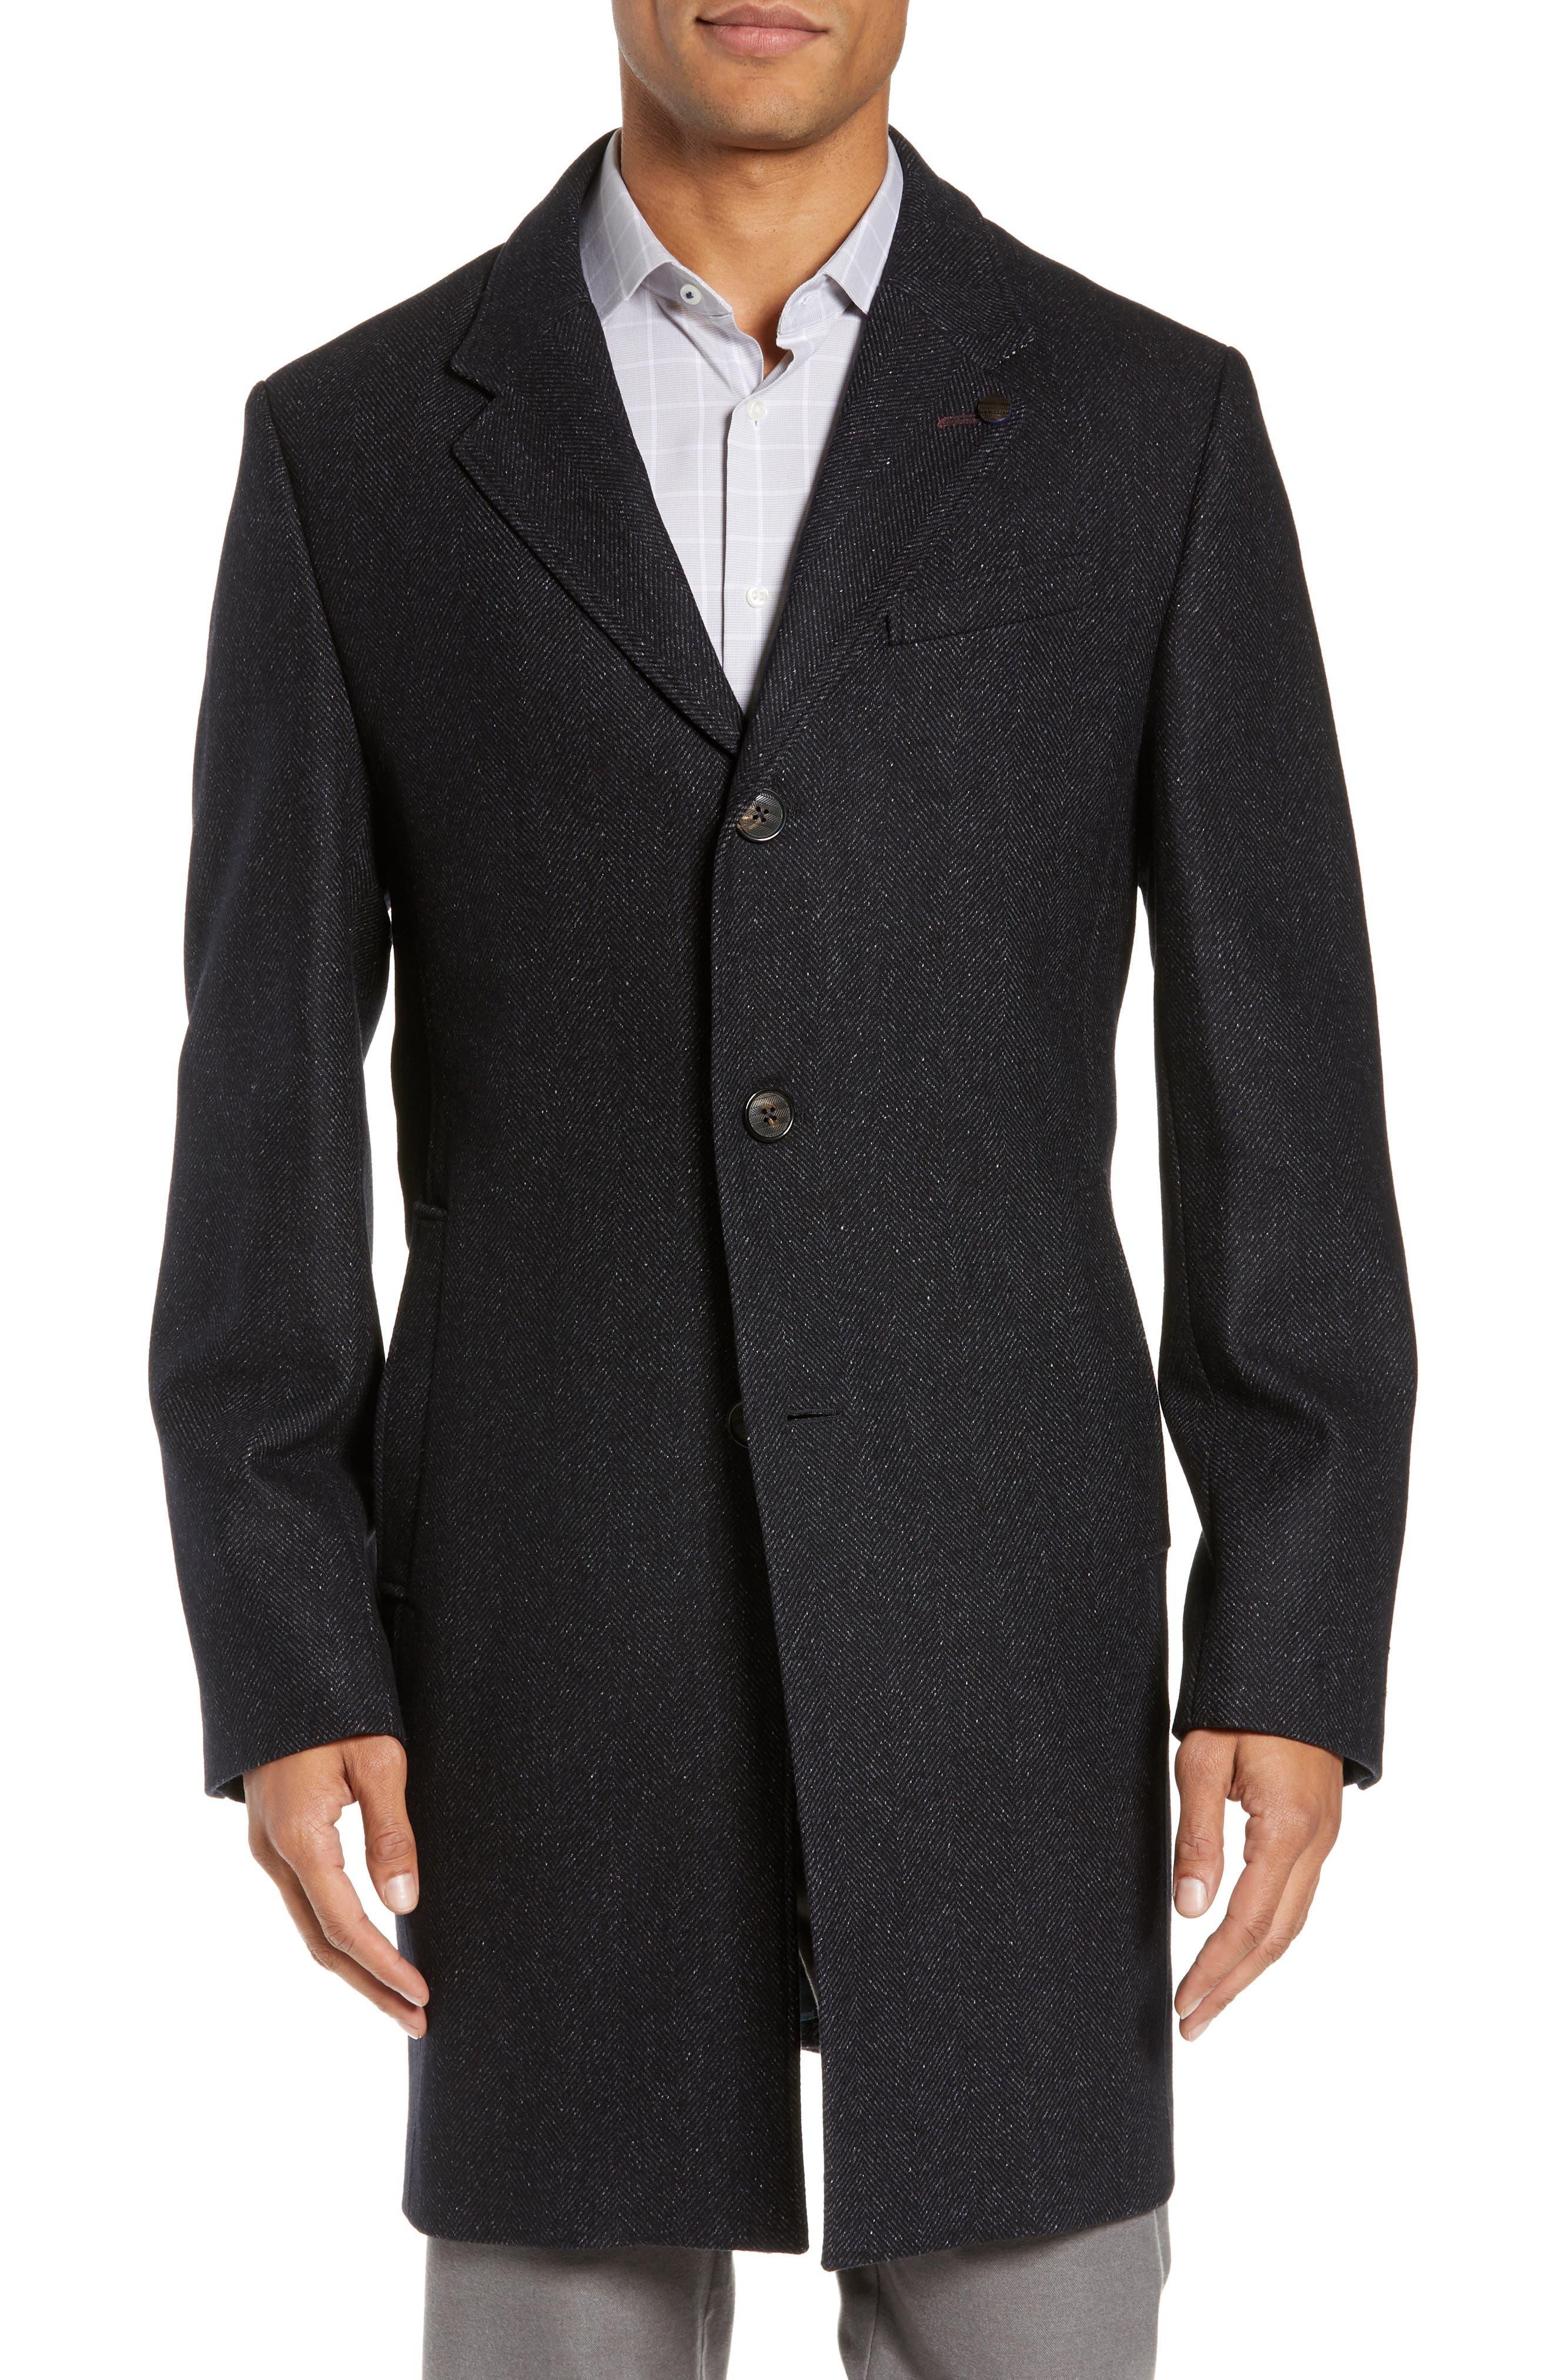 Herringbone Wool Blend Overcoat,                             Alternate thumbnail 4, color,                             NAVY